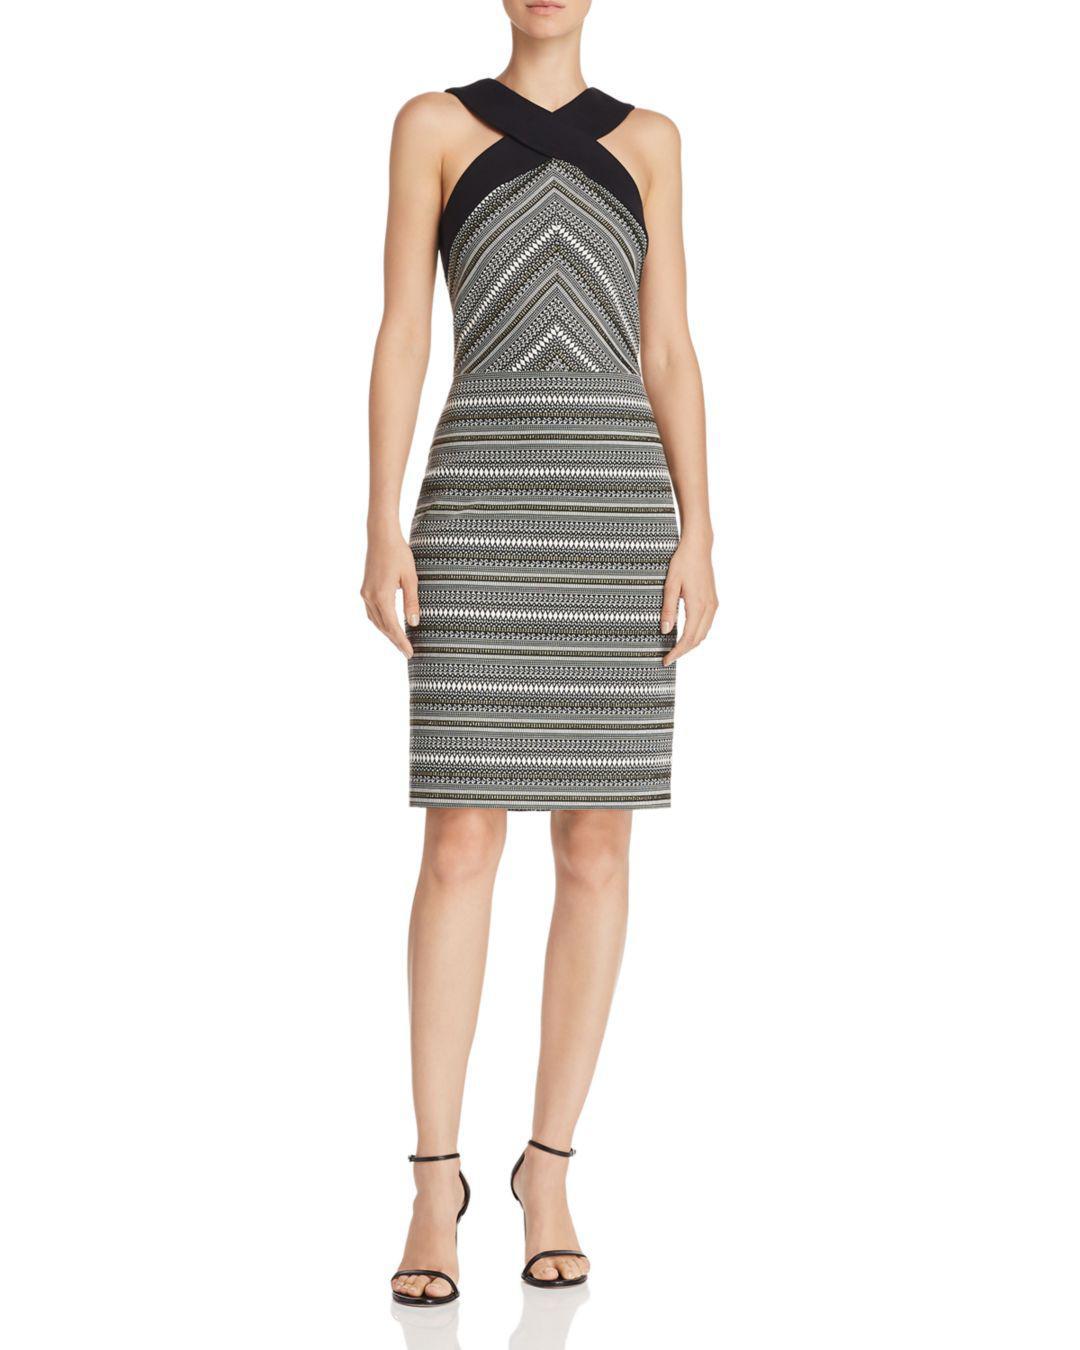 af422e5ee7f8 Laundry by Shelli Segal Jacquard Geometric Sheath Dress in Black - Lyst